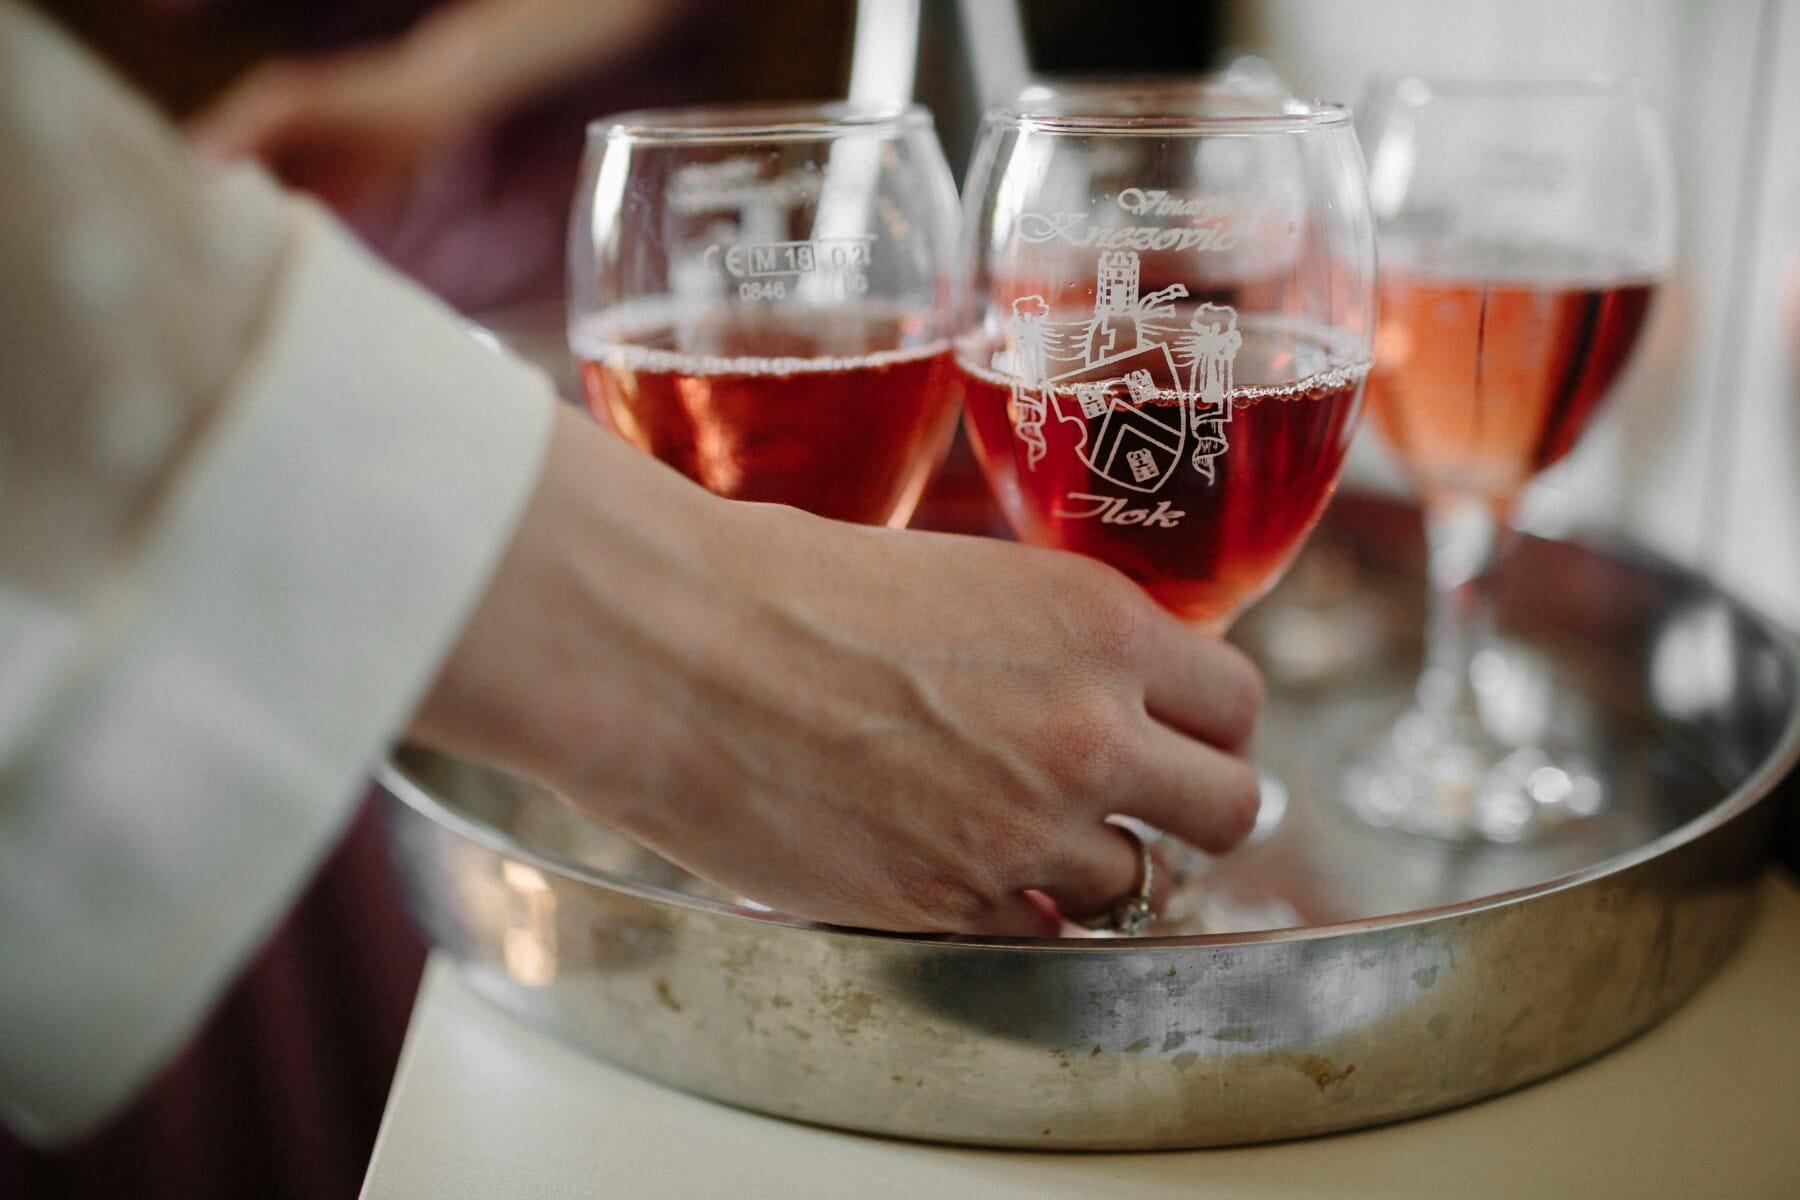 Rotwein, rötlich, Wein, Kristall, Glas, Dame, Frau, Hand, Partei, Alkohol